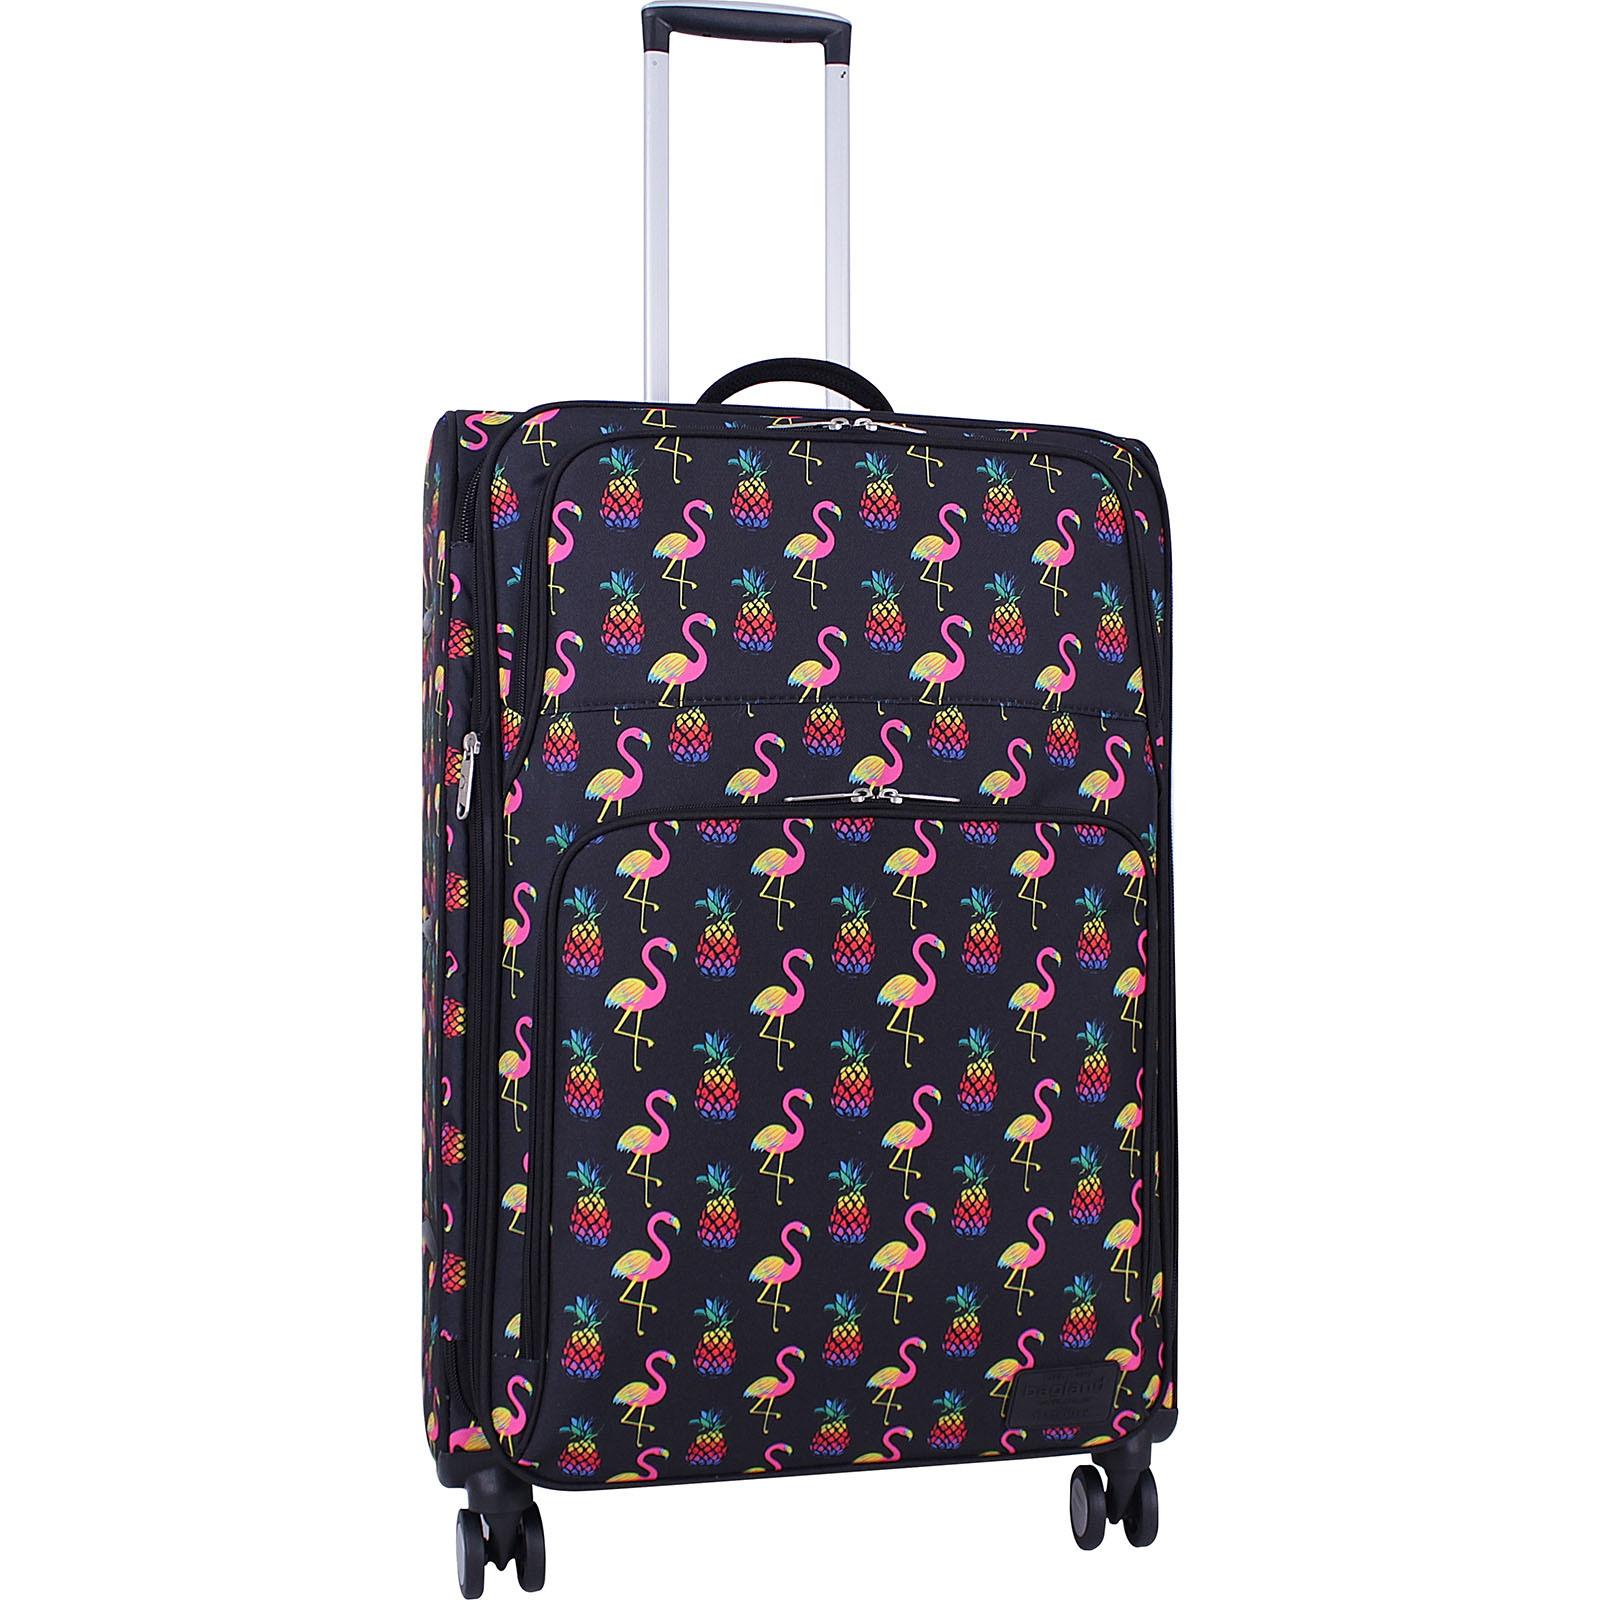 Дорожные чемоданы Чемодан Bagland Валенсия большой дизайн 83 л. сублімація 361 (0037966274) IMG_5499_суб.361_.JPG